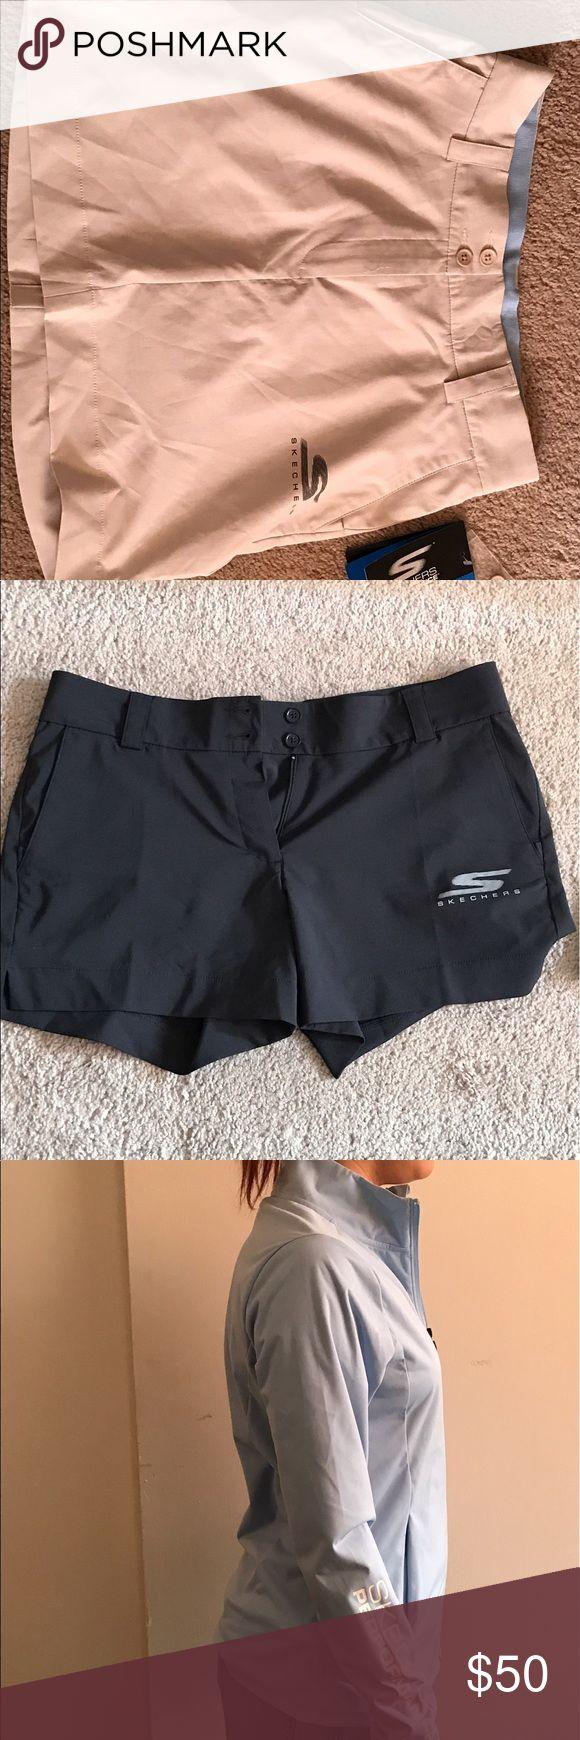 Women's golf set of 2 tops/ 2bottoms/ jacketshoes Black gold shorts:8; black collared shirt:S; black collared shirt with white:M; blue jacket:S gold shoes:8.5; tan sketcher golf skort:6 Other